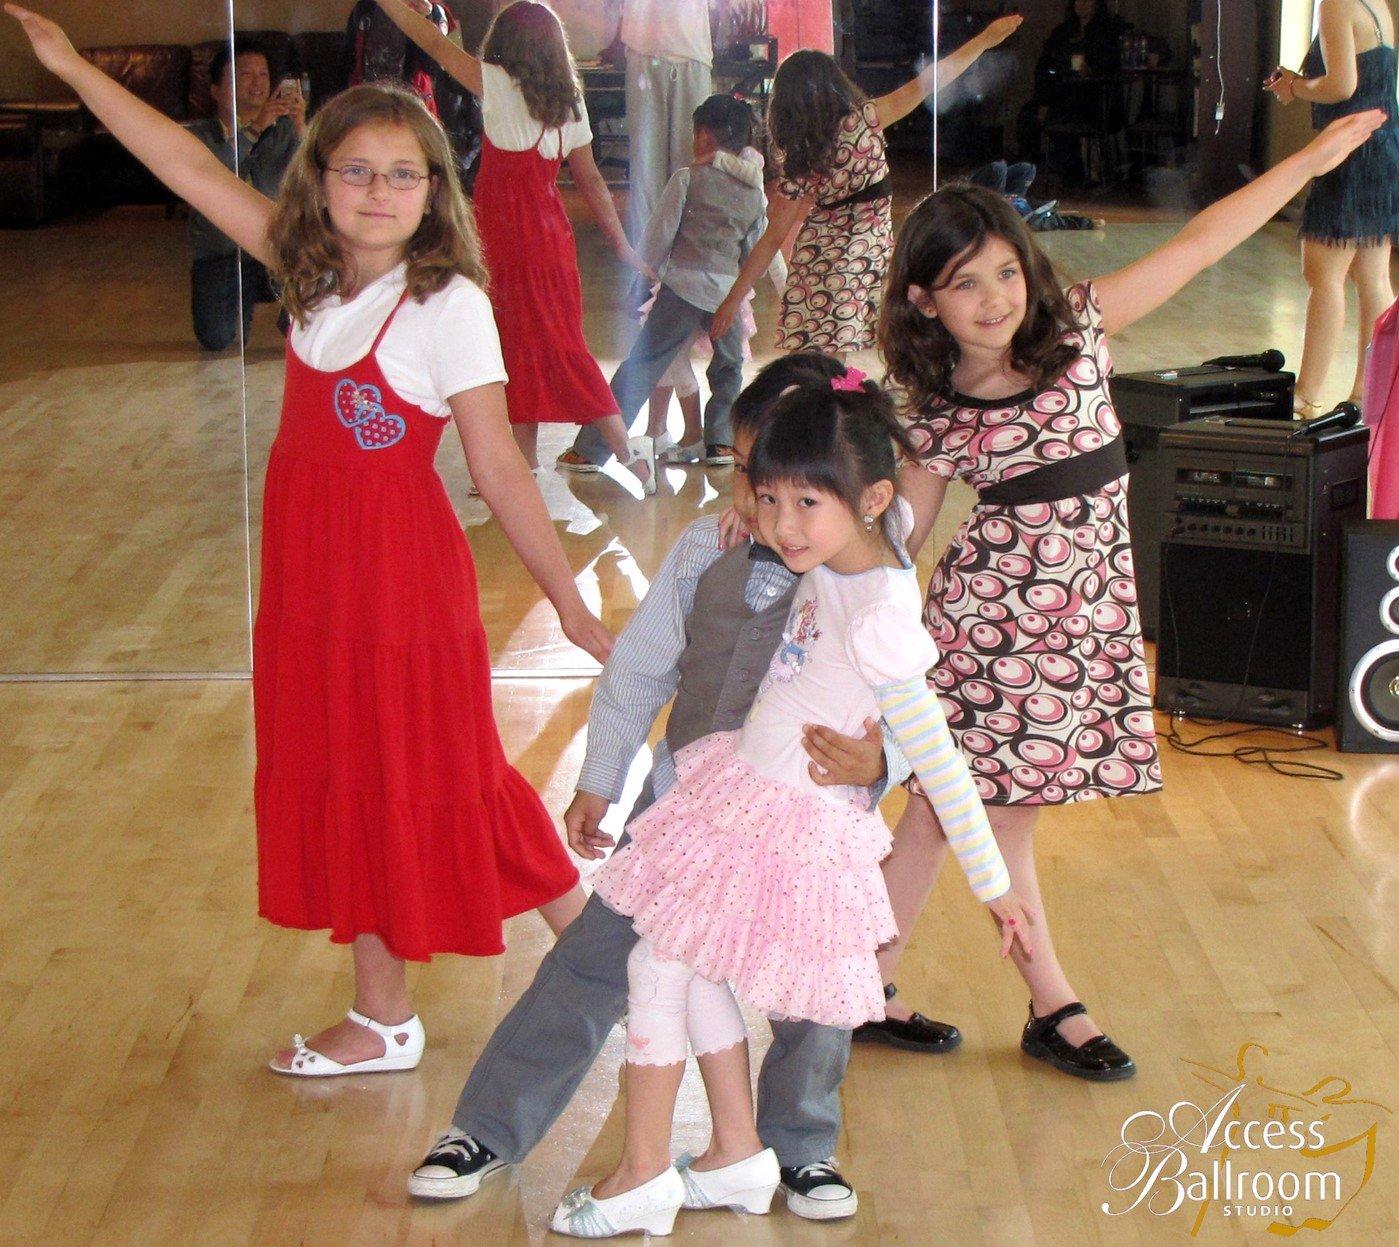 kids dance lessons toronto access ballroom kids and teens ballroom dance lessons four 4 kids taking dance poses kids dip asian boy asian girl two white girls